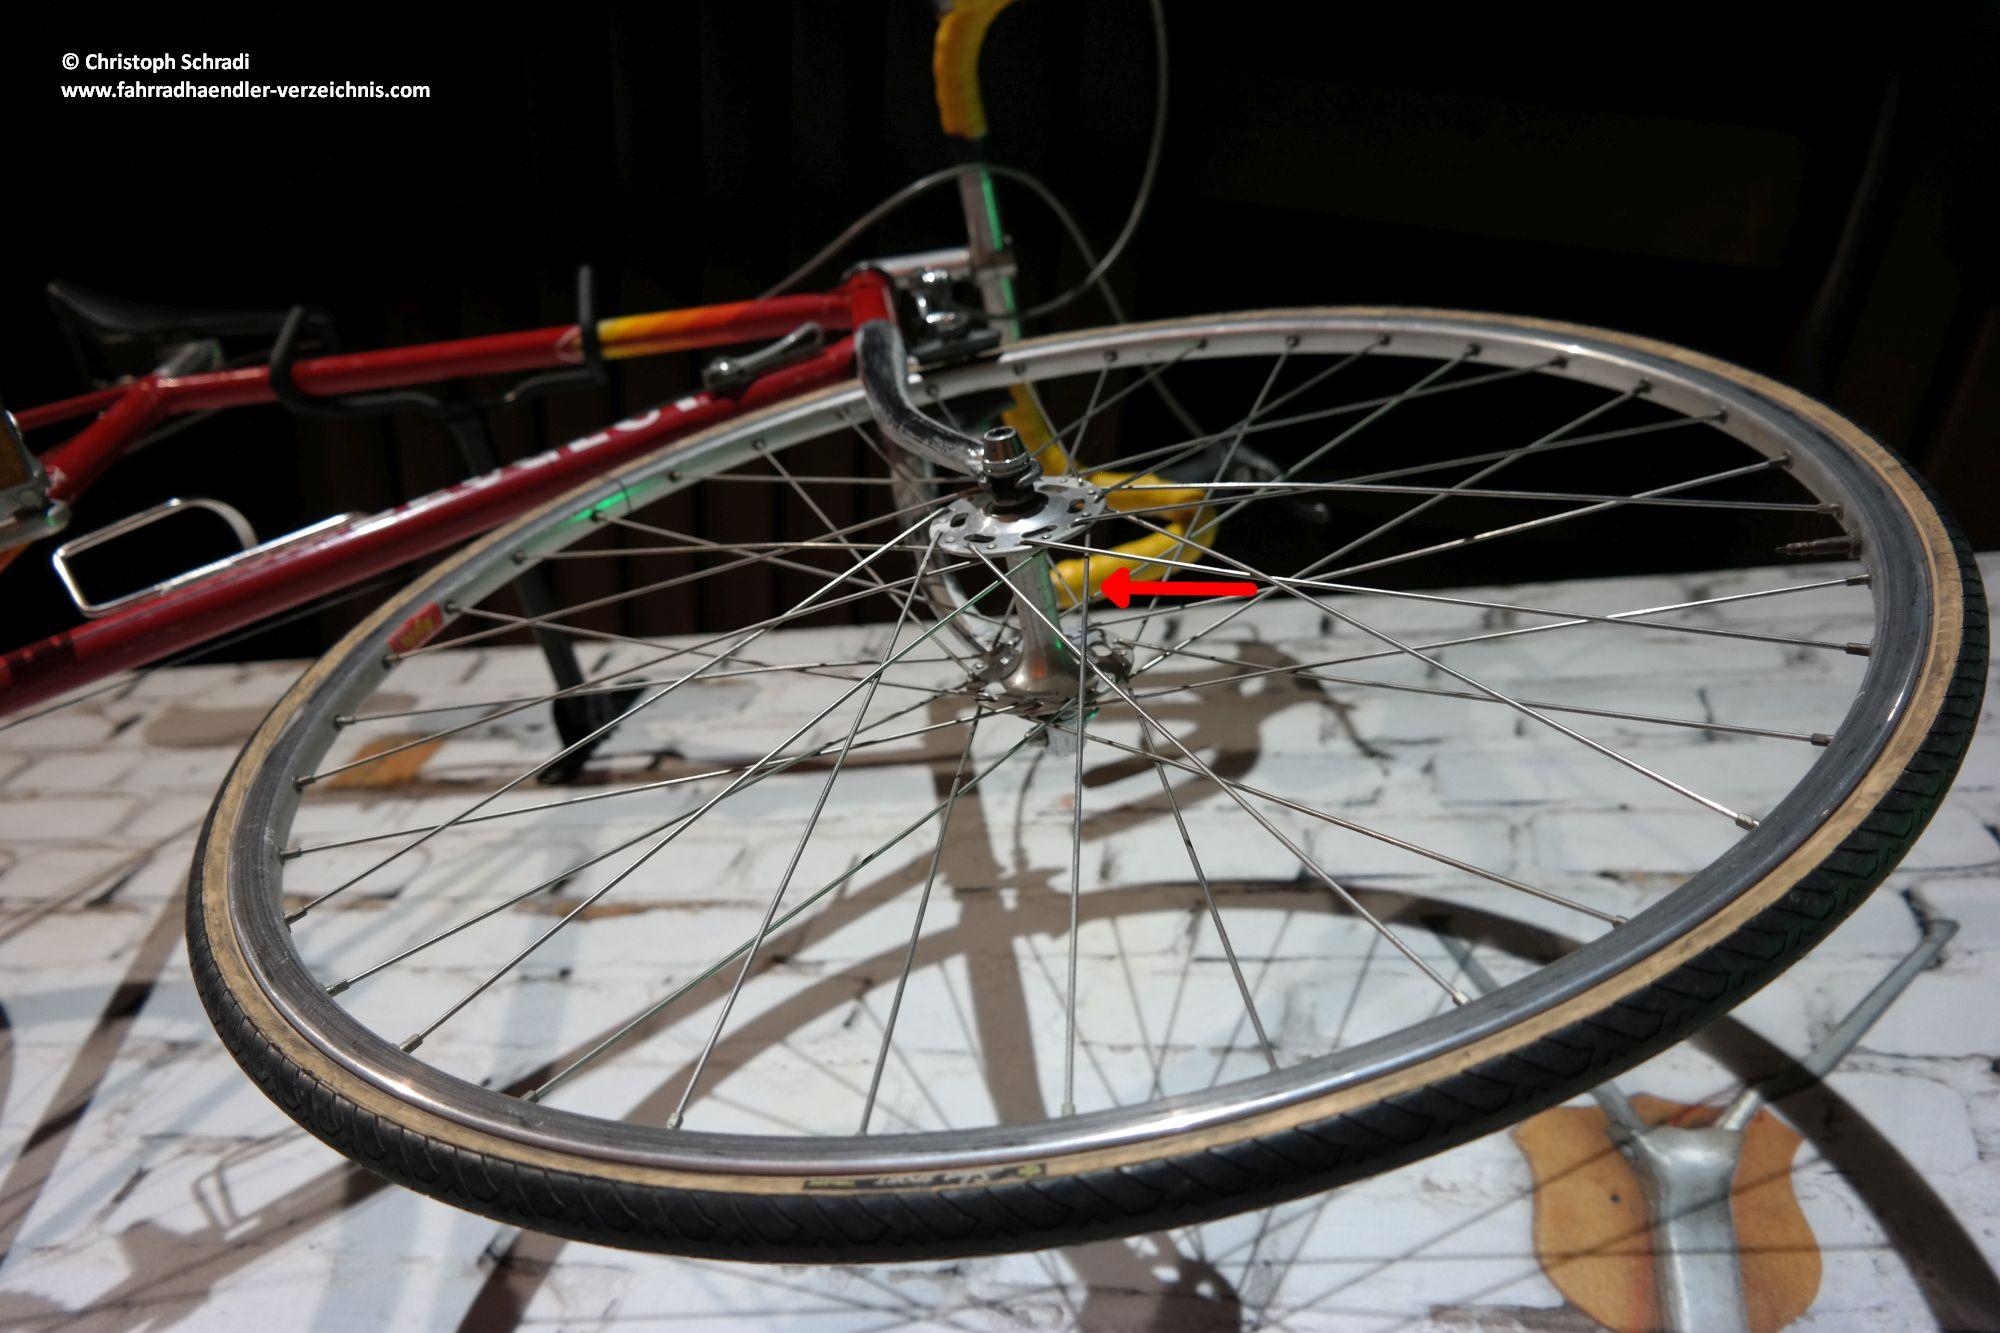 fahrradnabe laufradnabe am fahrrad e bike. Black Bedroom Furniture Sets. Home Design Ideas